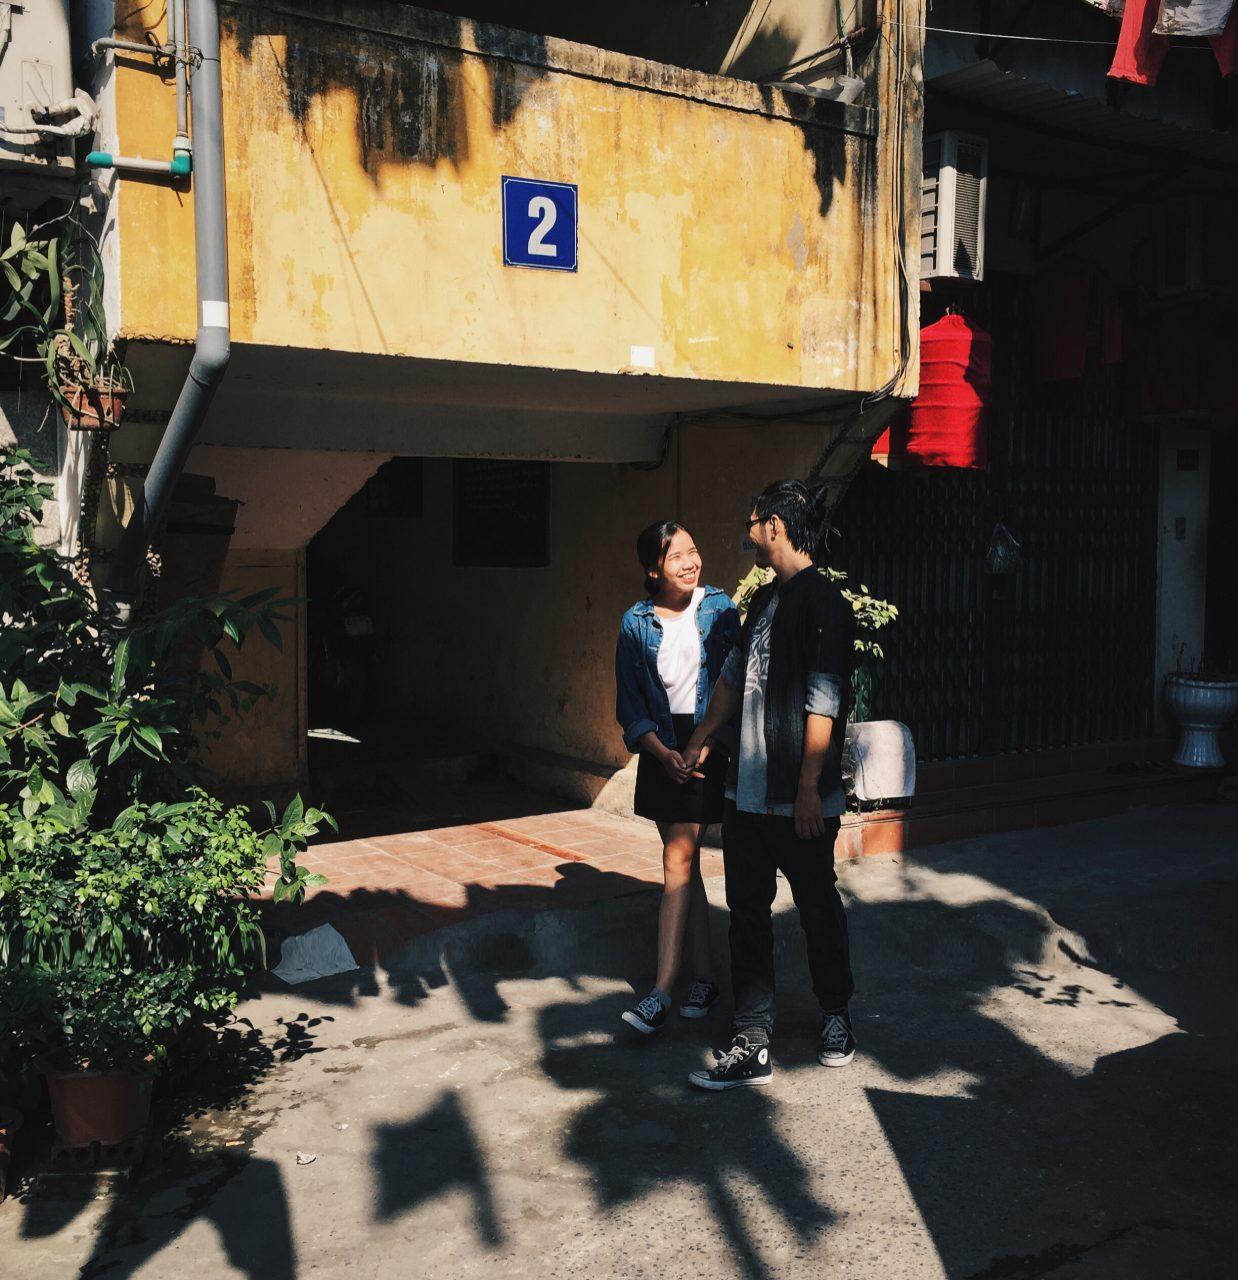 IMG_3300-1238x1280 From best friends to lovers Couples Weddings & Couples  ảnh cưới hà nội ảnh đôi ảnh đôi hà nội chụp ảnh paris chụp ảnh việt nam couple hanoi feature hanoi photographer việt nam vietnam photographer